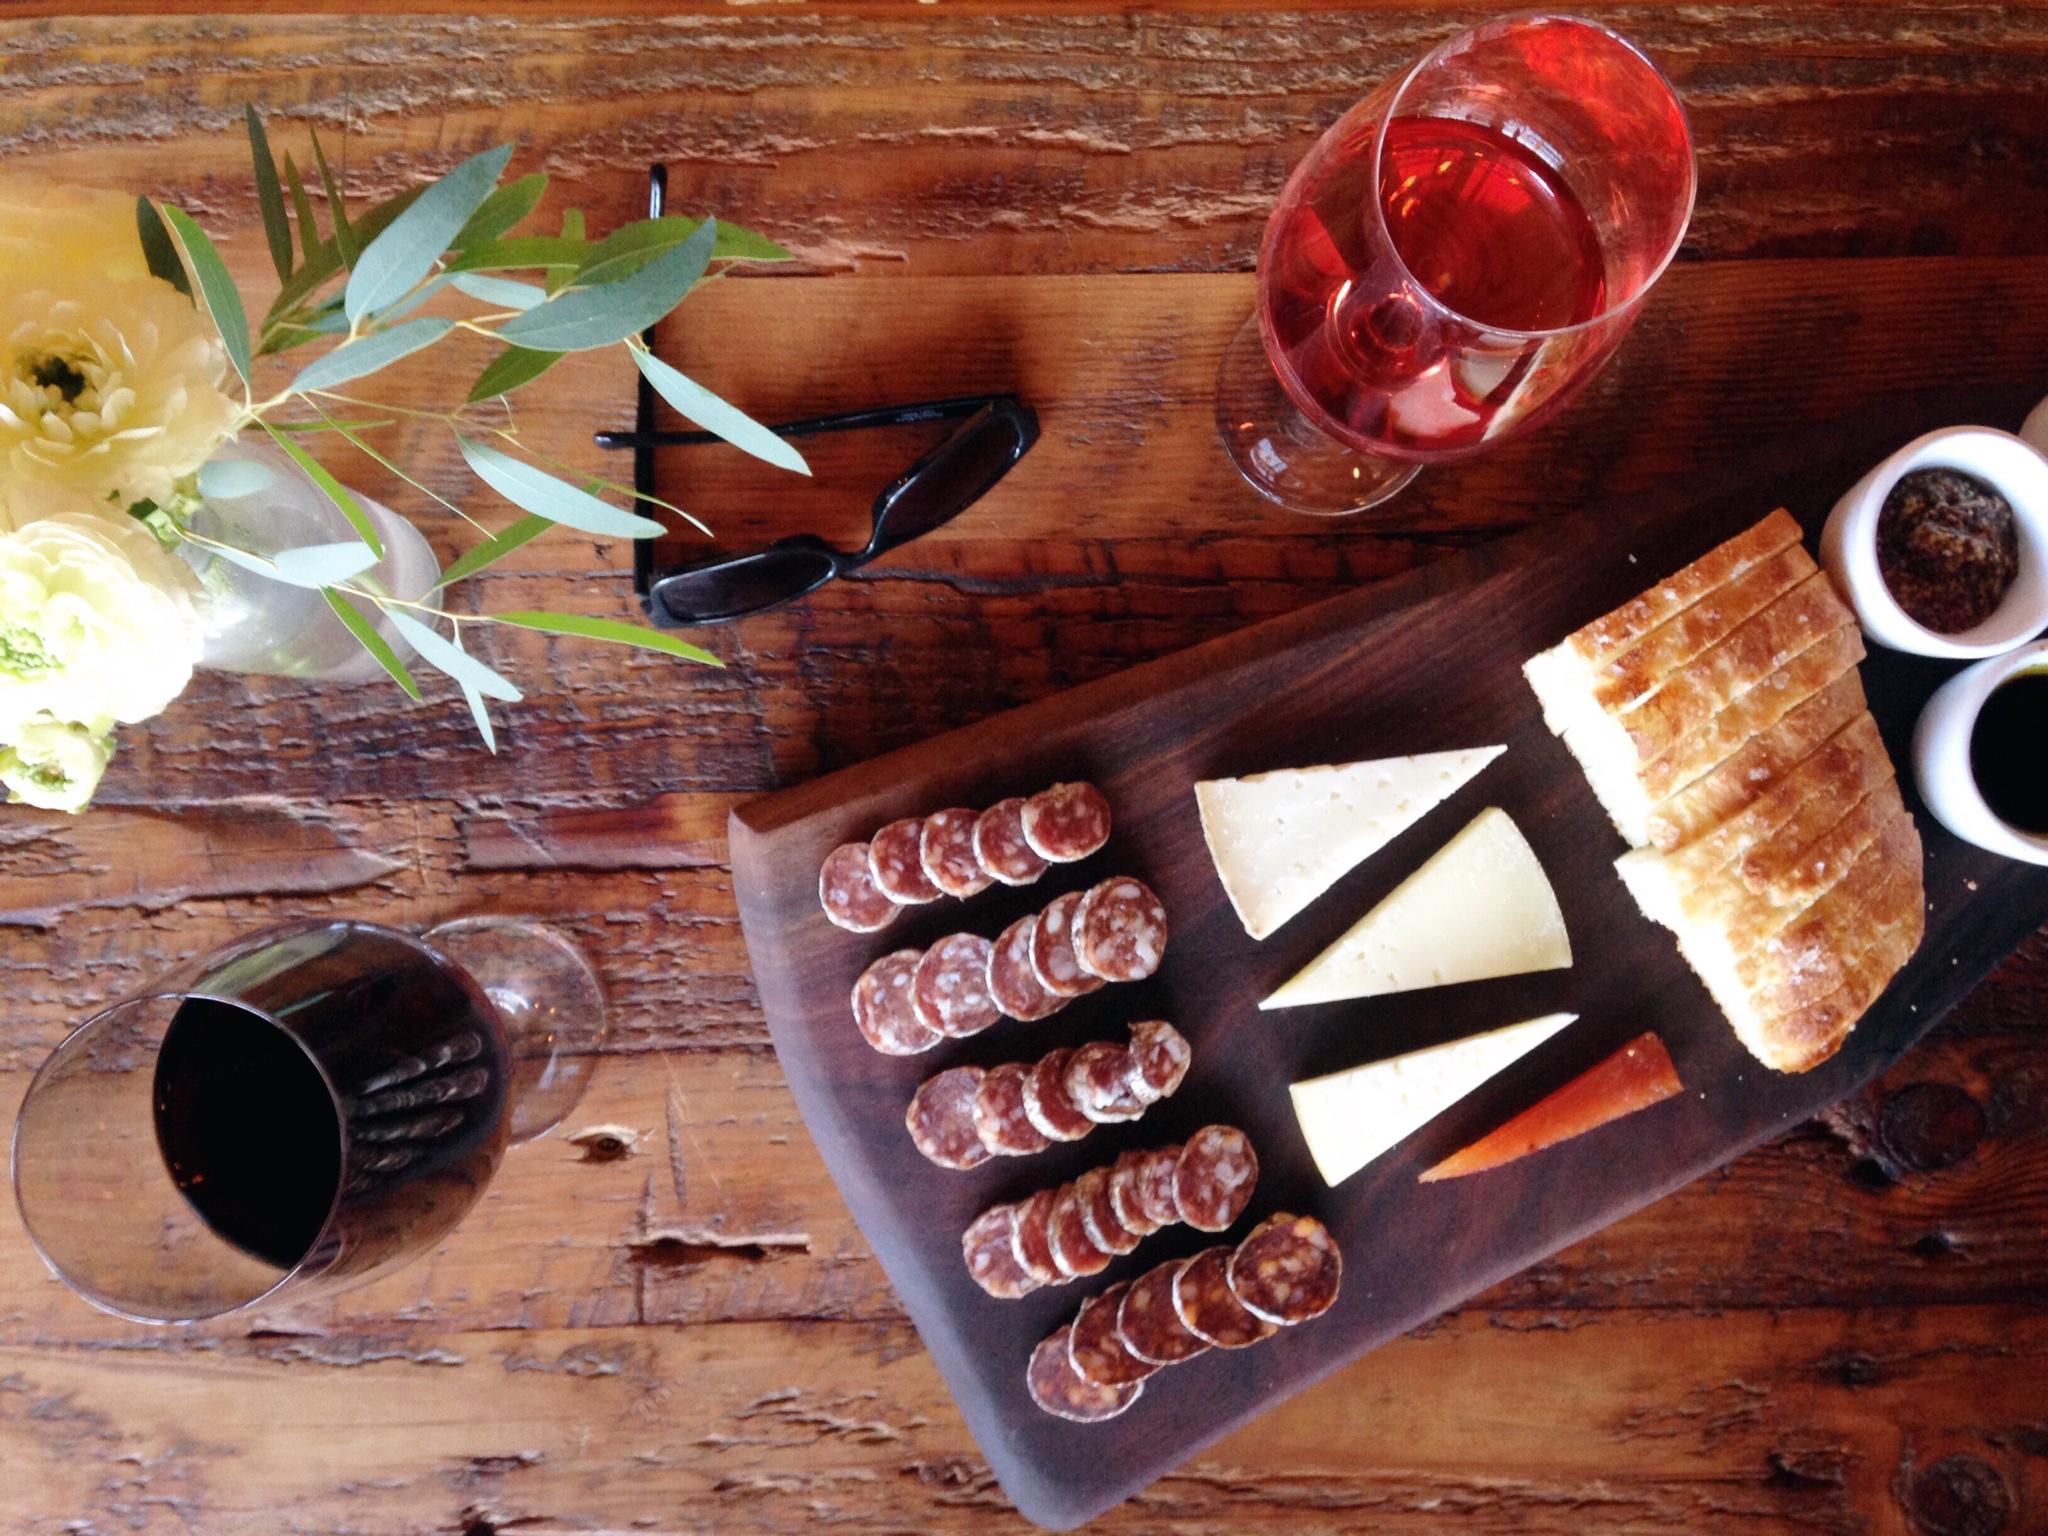 spread / Enso Winery